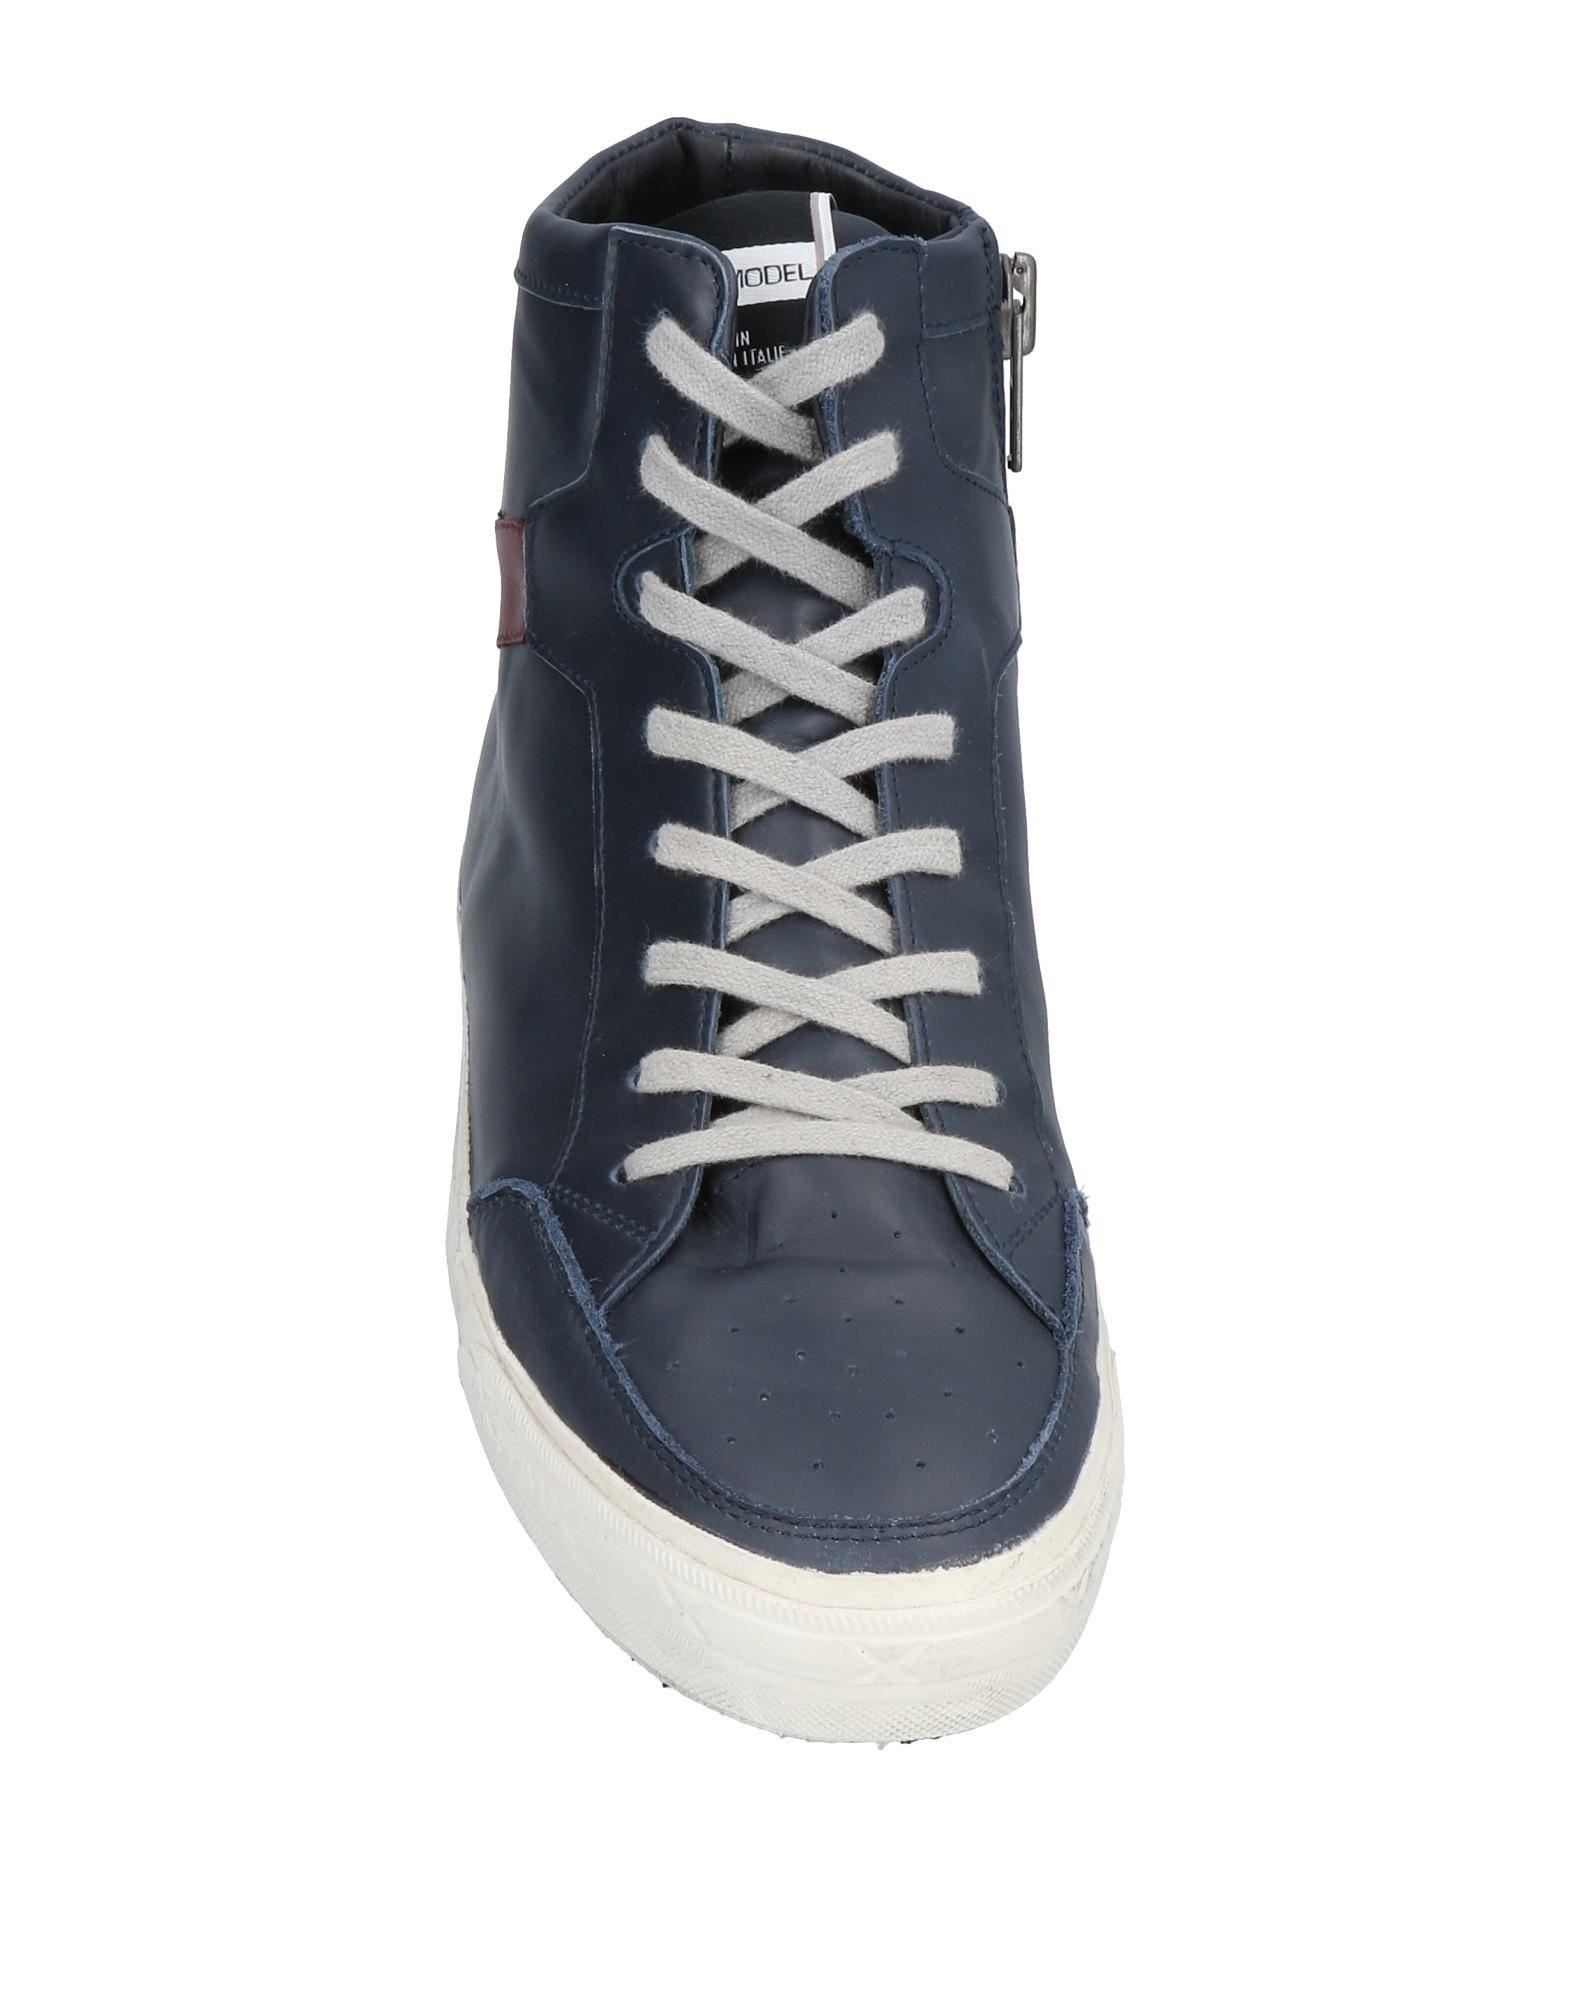 Philippe Model Sneakers Herren  Schuhe 11496217SF Gute Qualität beliebte Schuhe  9aa5e4